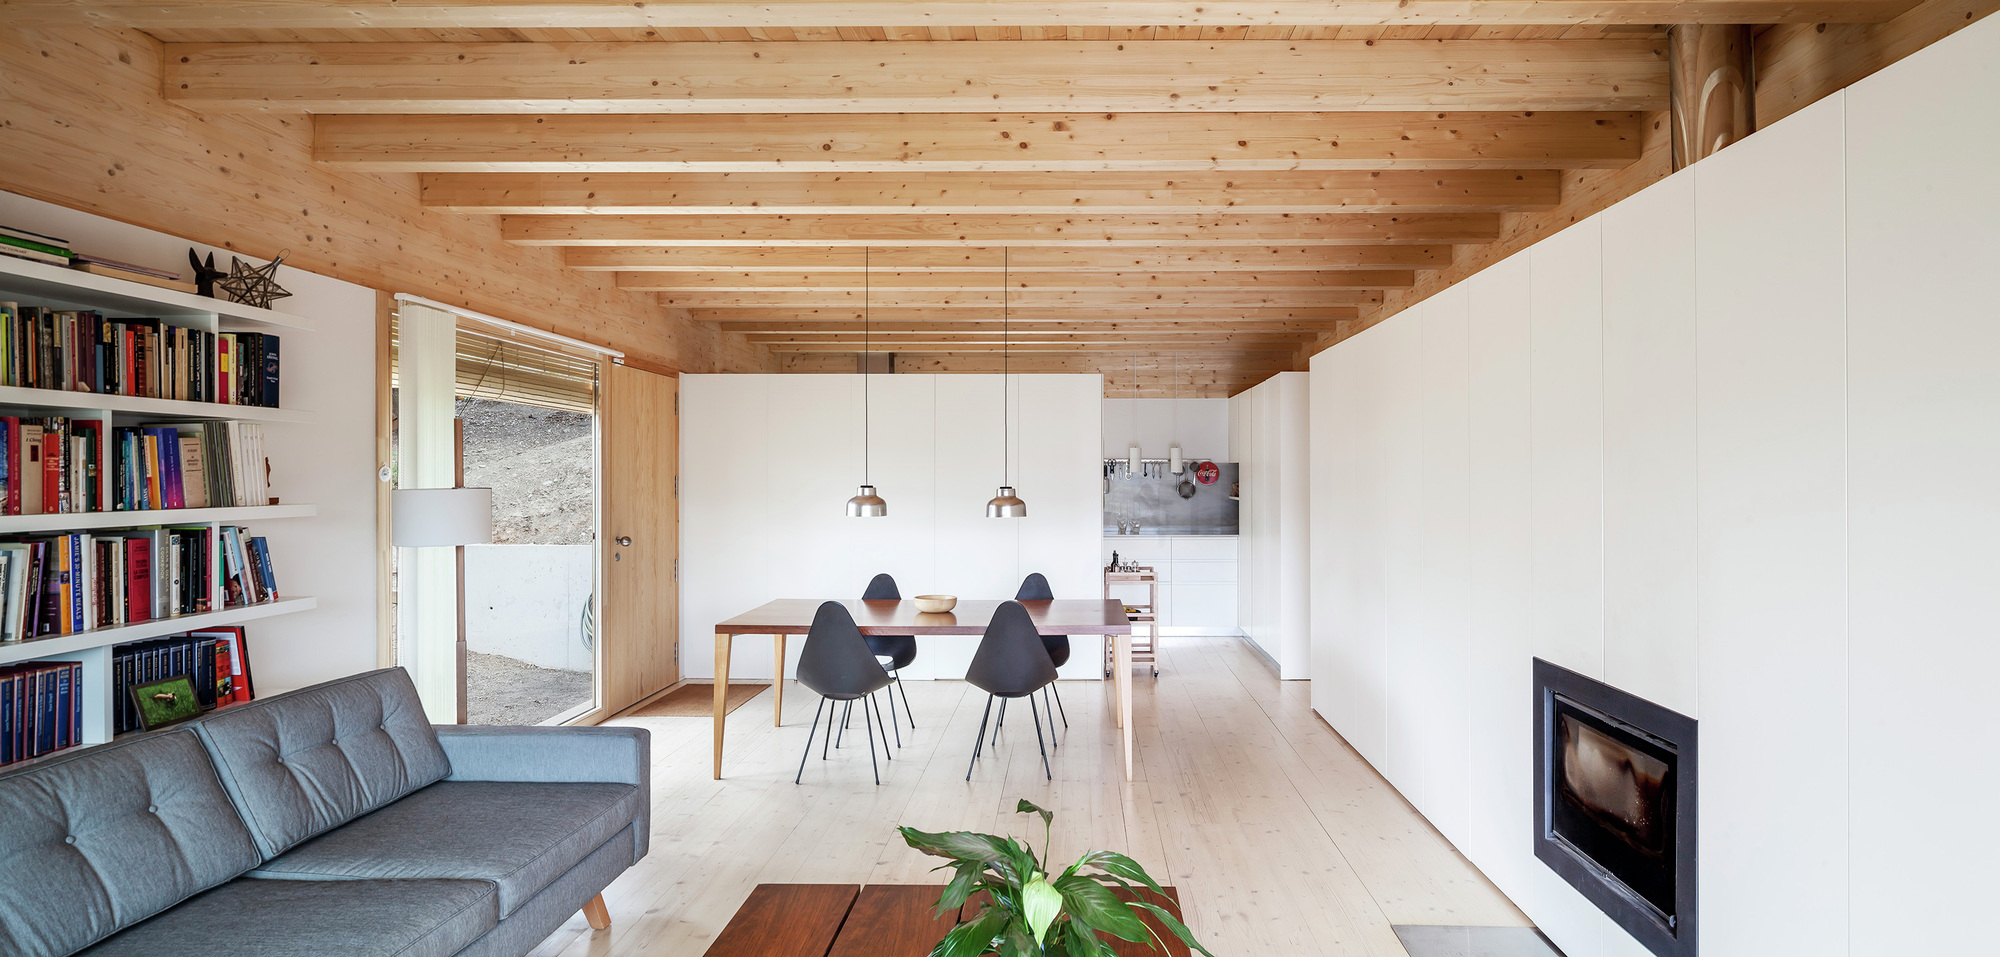 Galeria de casa llp alventosa morell arquitectes 5 - Pegatinas para la pared ...